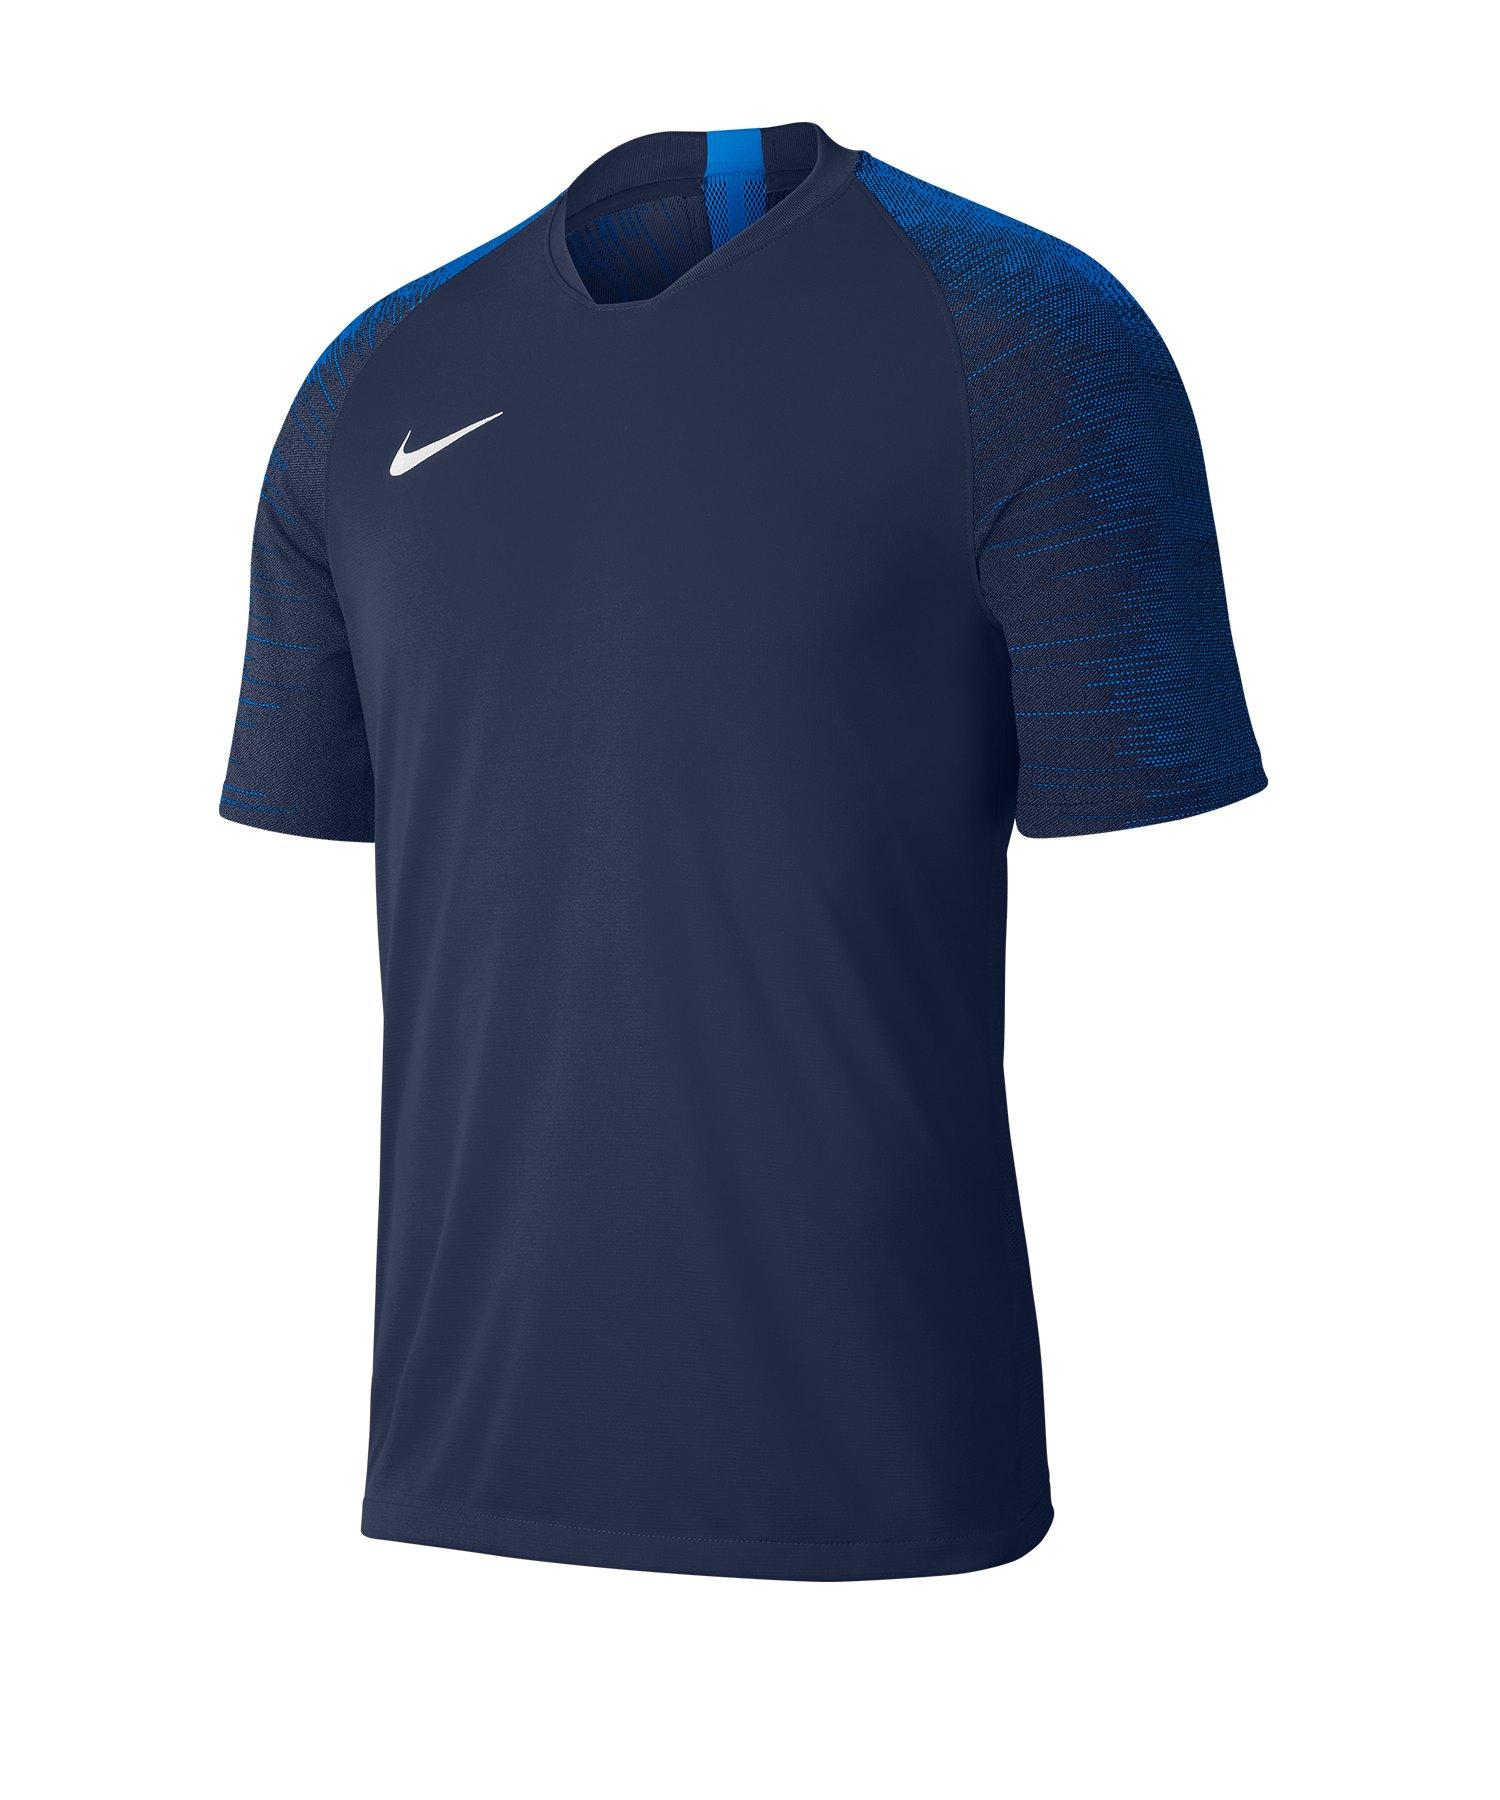 Nike Strike Trikot kurzarm Blau F410 - blau